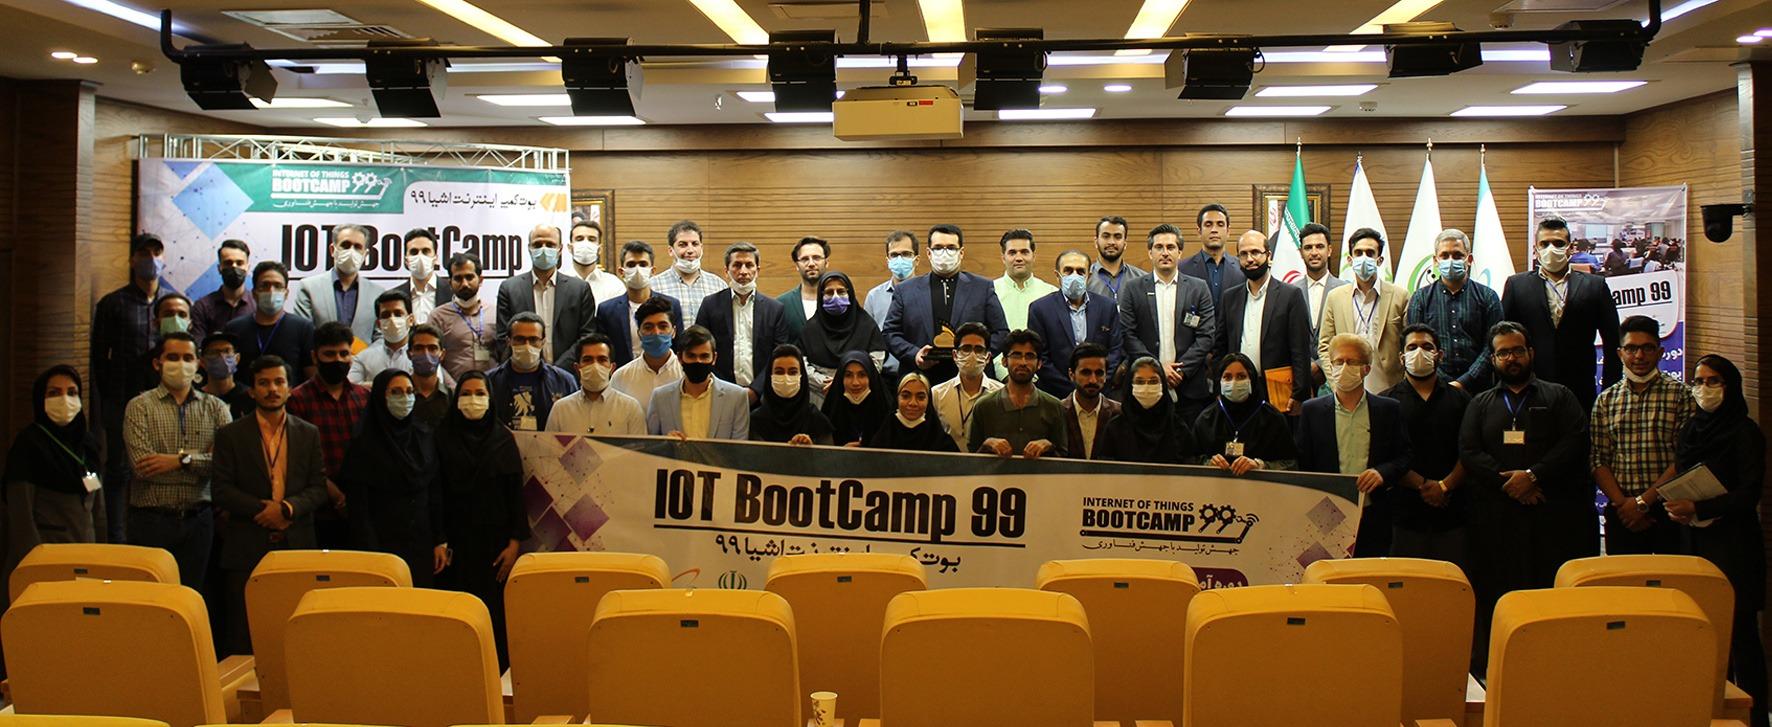 IoT BootCamp 99